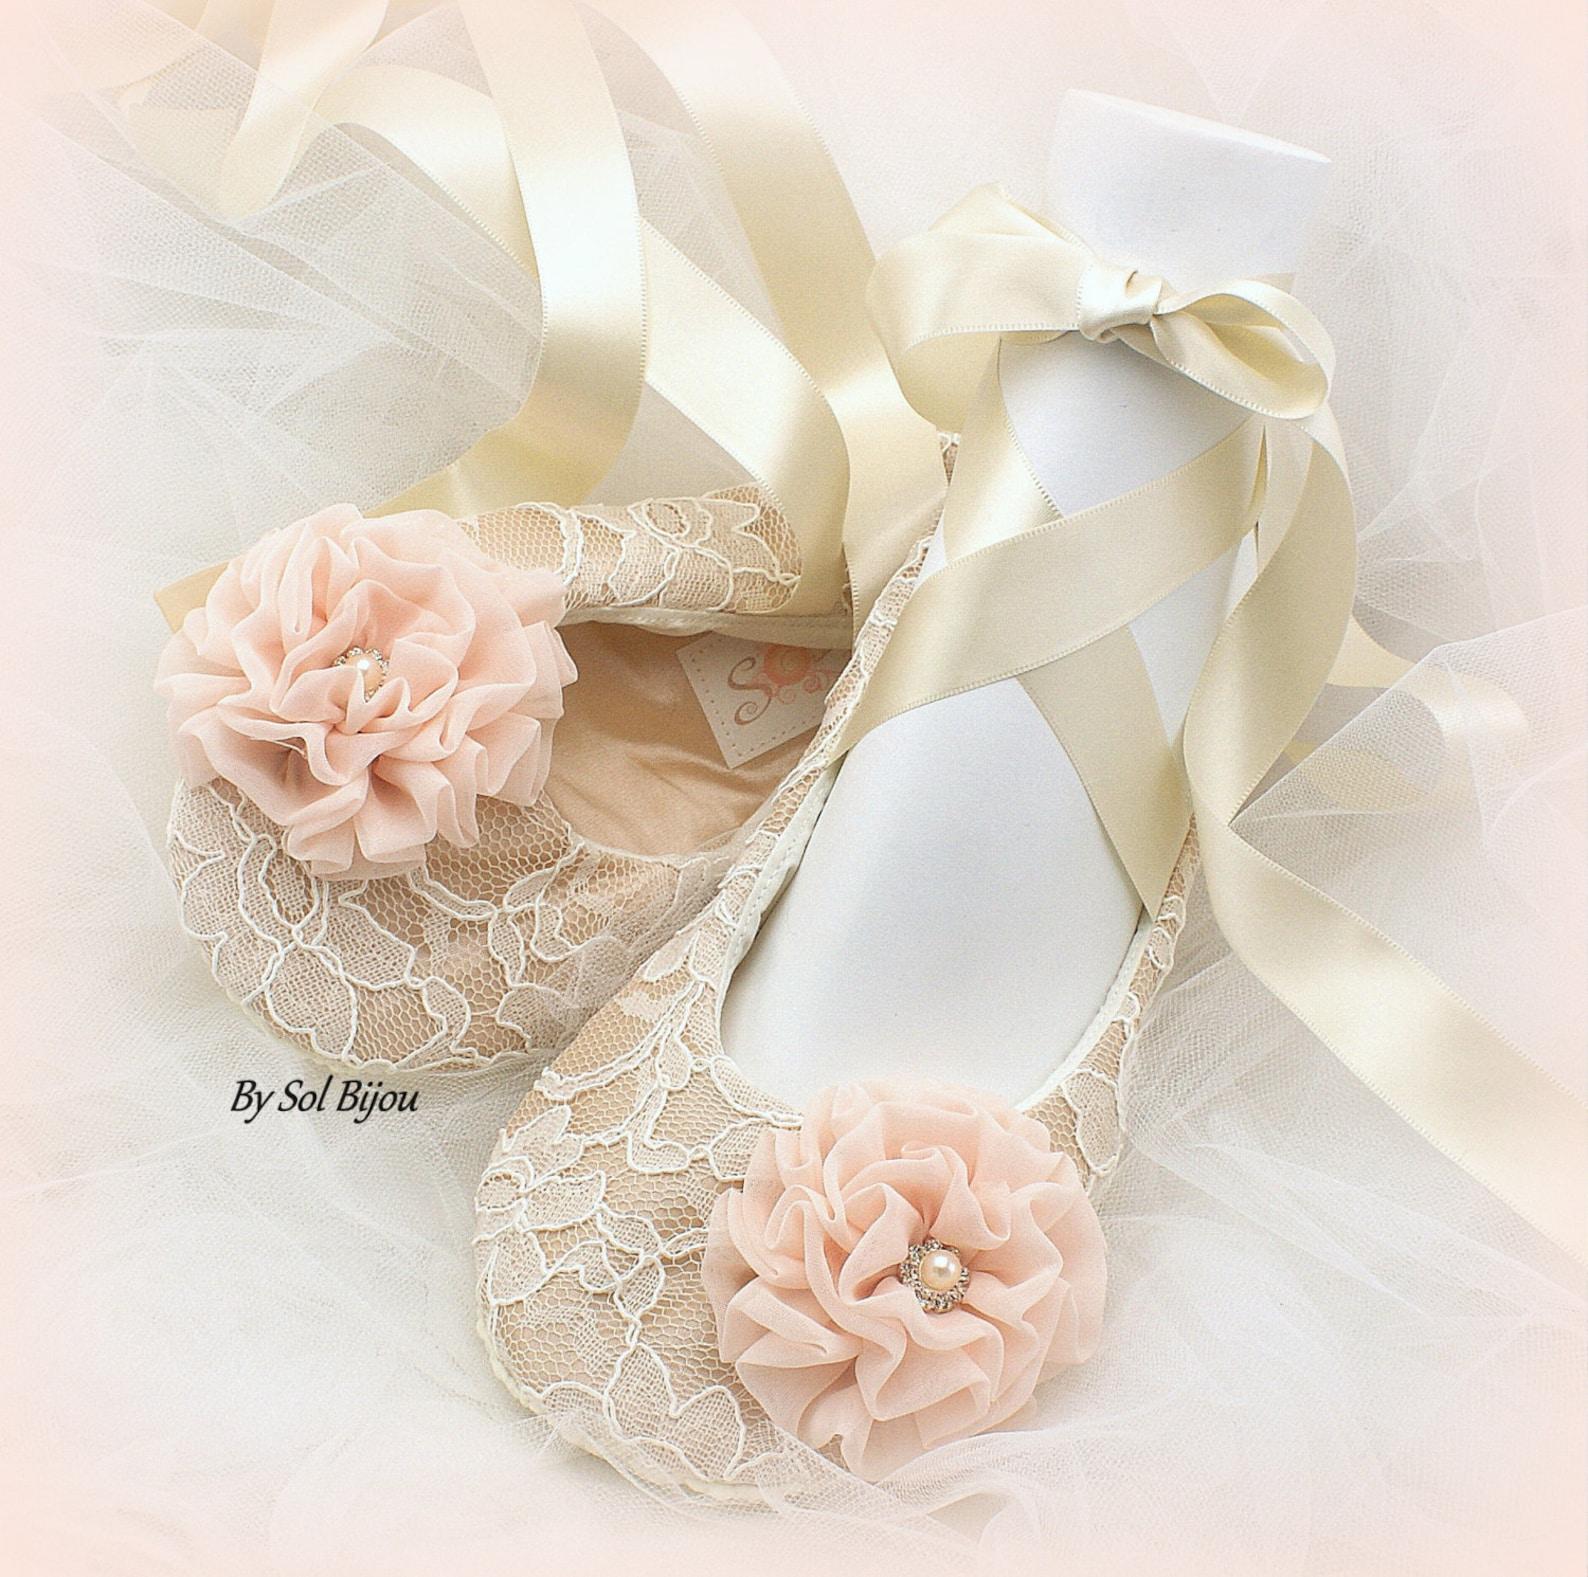 wedding flats,champagne,ivory,blush,rose,gold,ballet flats,elegant wedding,lace flats, bridal,ballerina slippers, crystals, vint